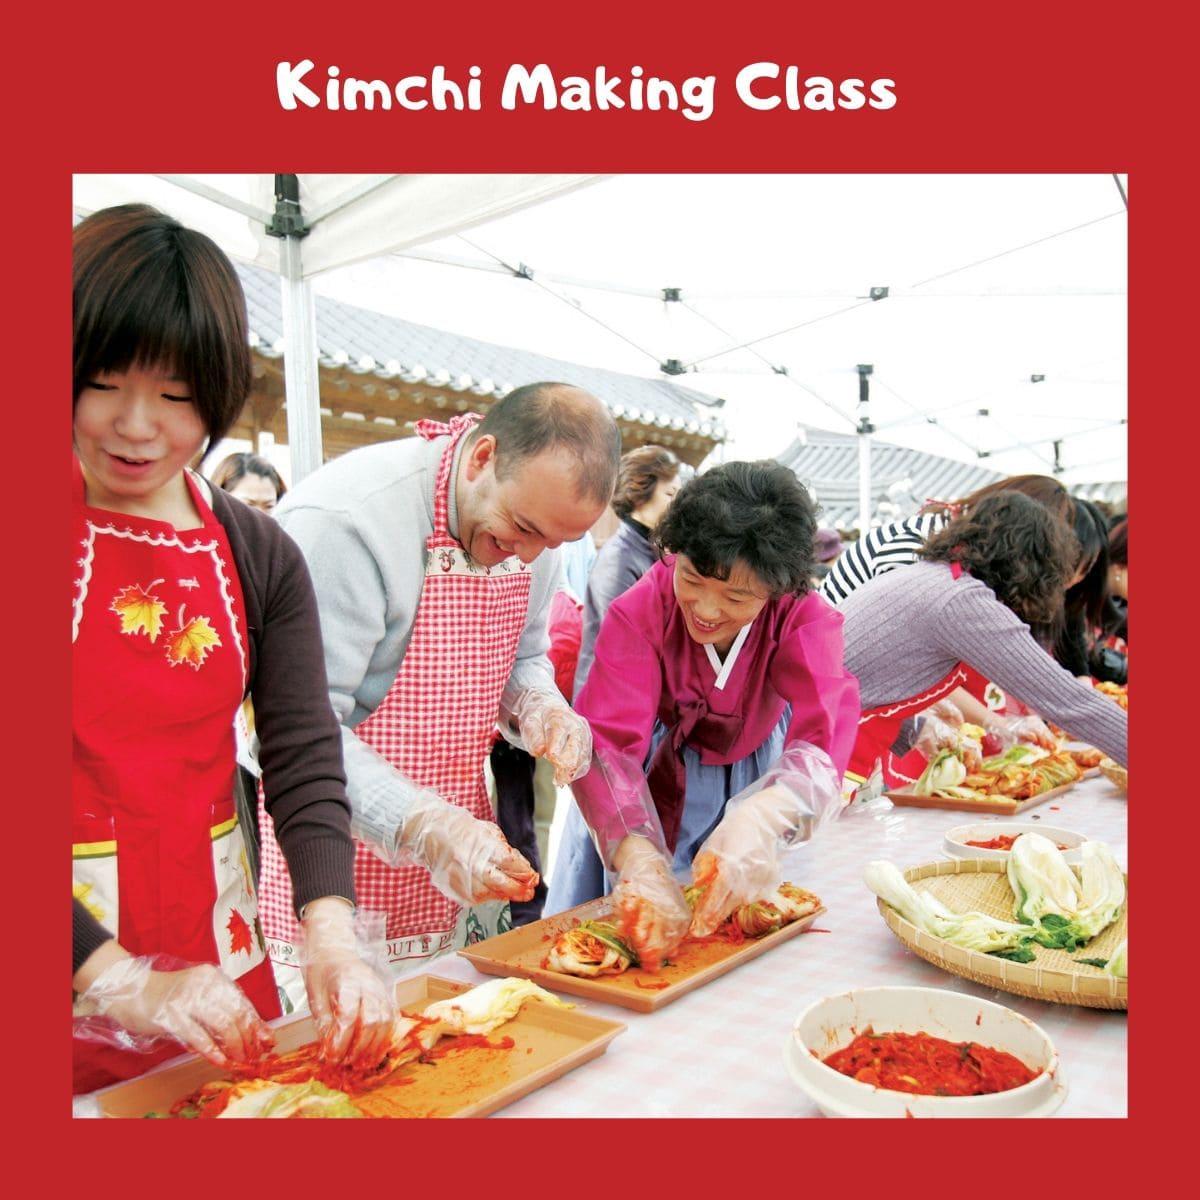 Pengalaman Seru Liburan Musim Dingin di Korea Selatan - Kimchi Making Class - Sumber Wikimedia